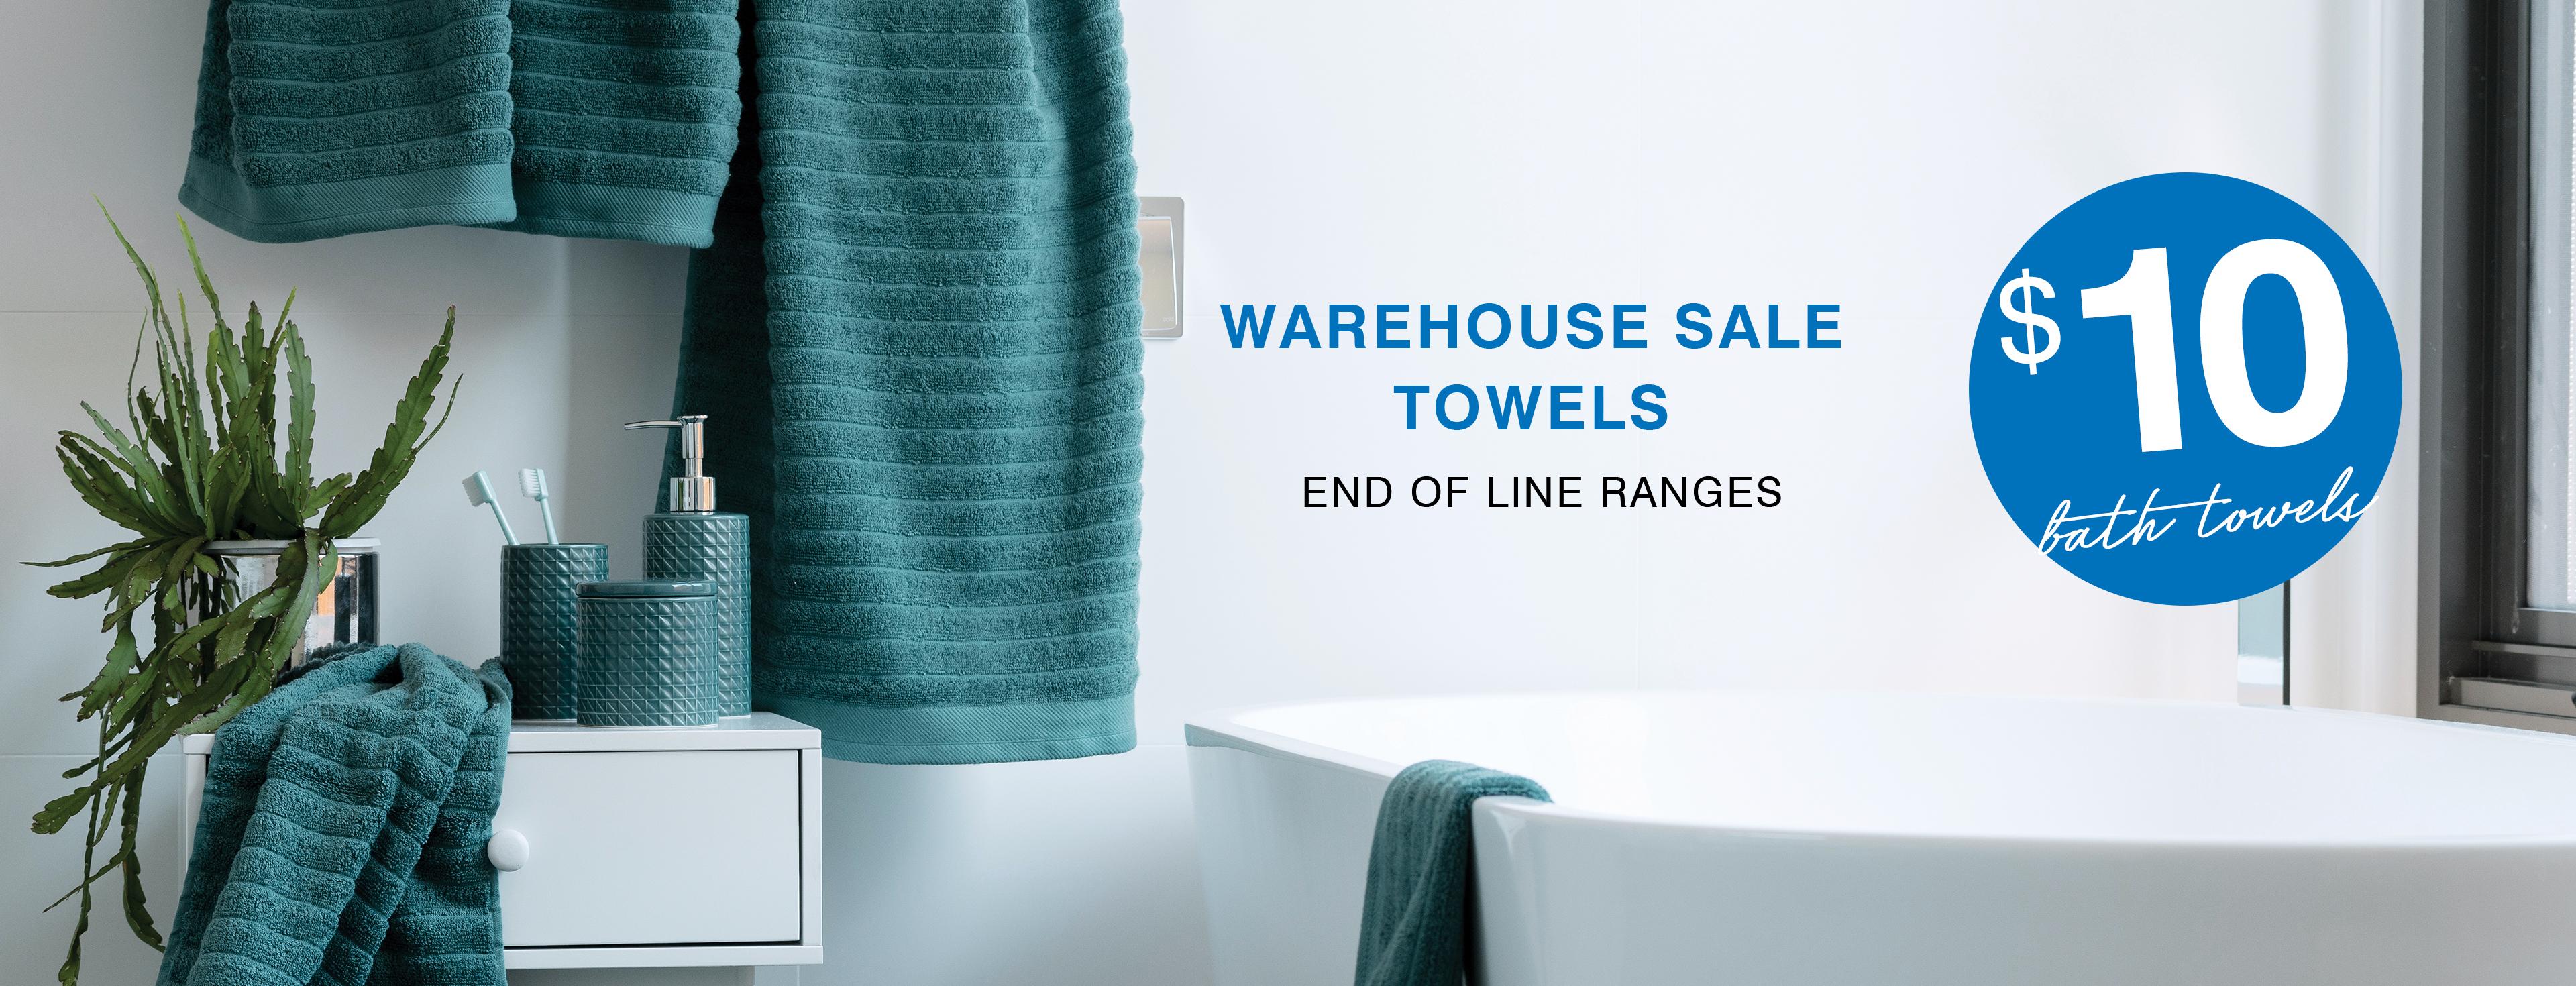 Bed Linen | Online Bedding Stores Australia | Linen House